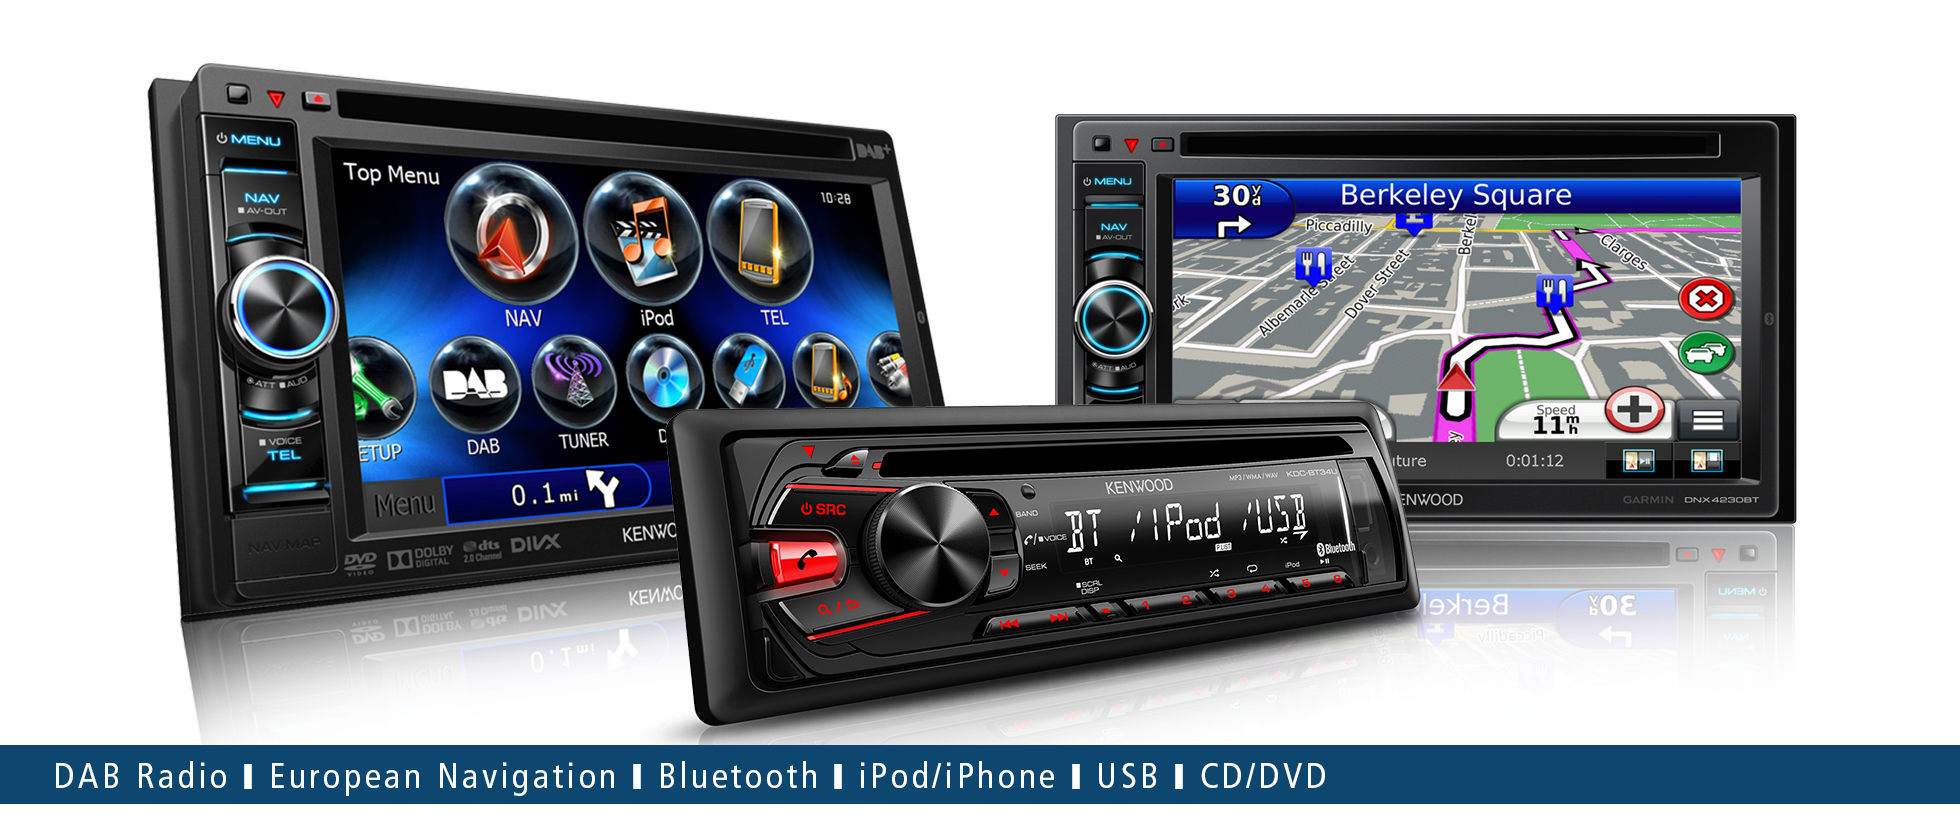 Magnificent Sat Nav Apple Carplay Android Auto Car Audio Dab Radio Wiring Cloud Rineaidewilluminateatxorg